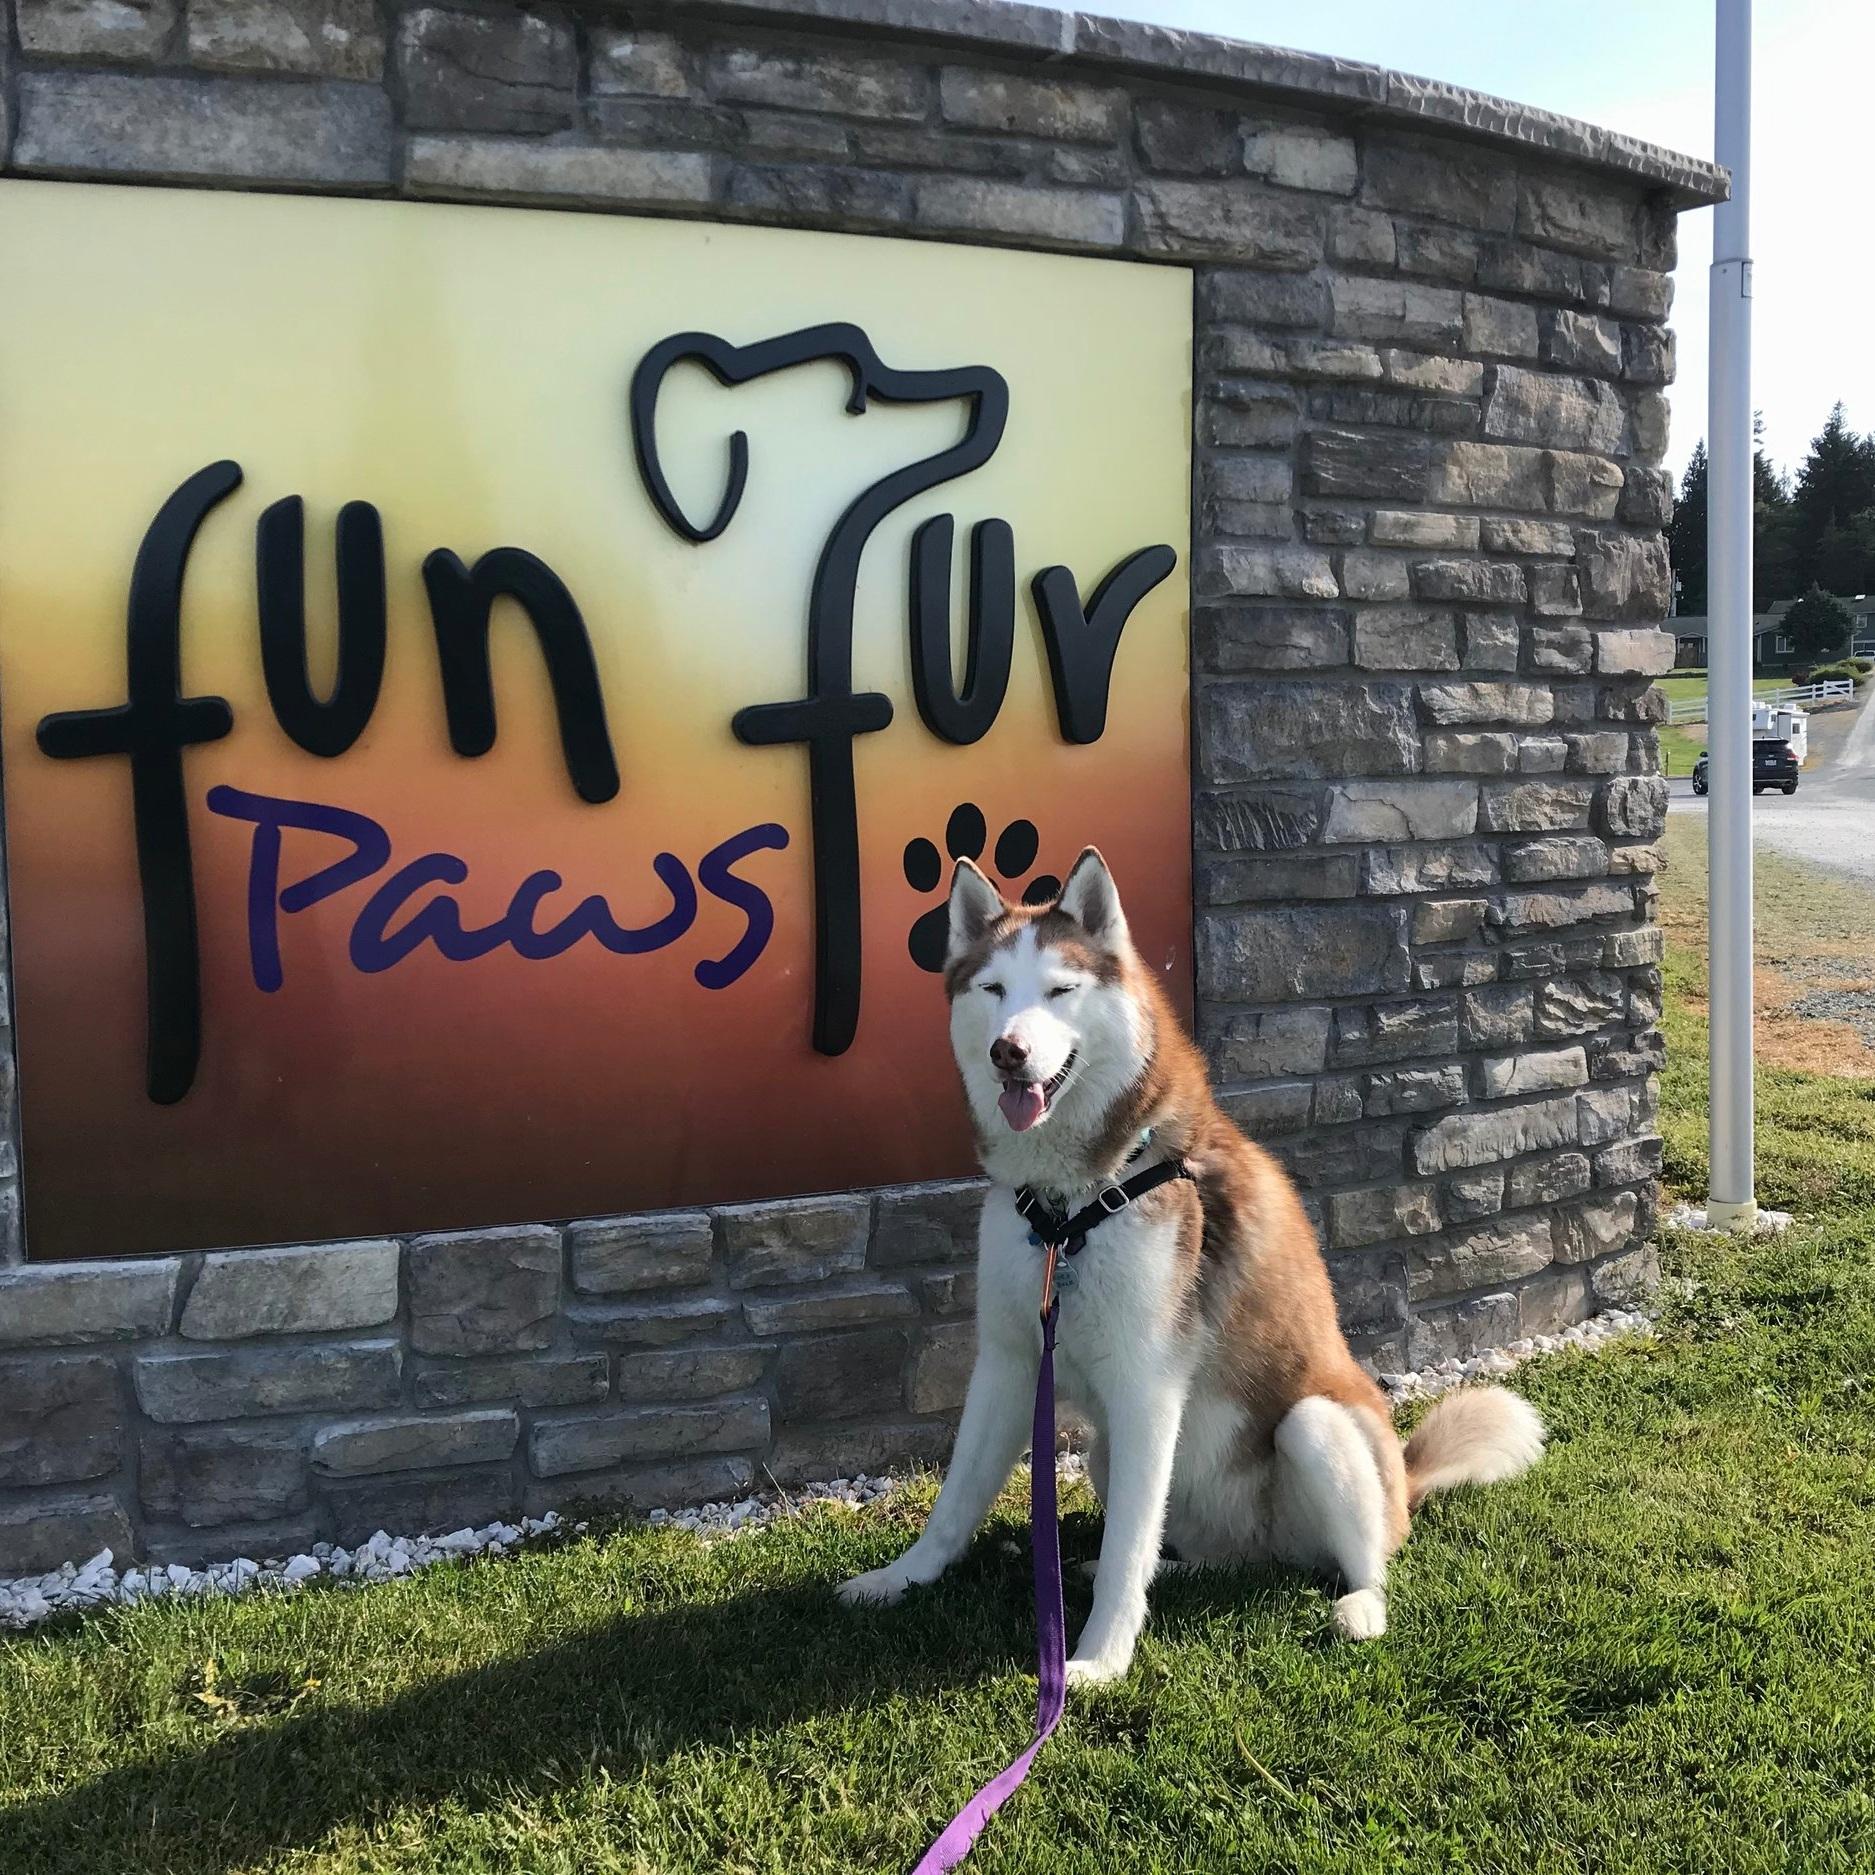 Fun+Fur+Paws.jpg